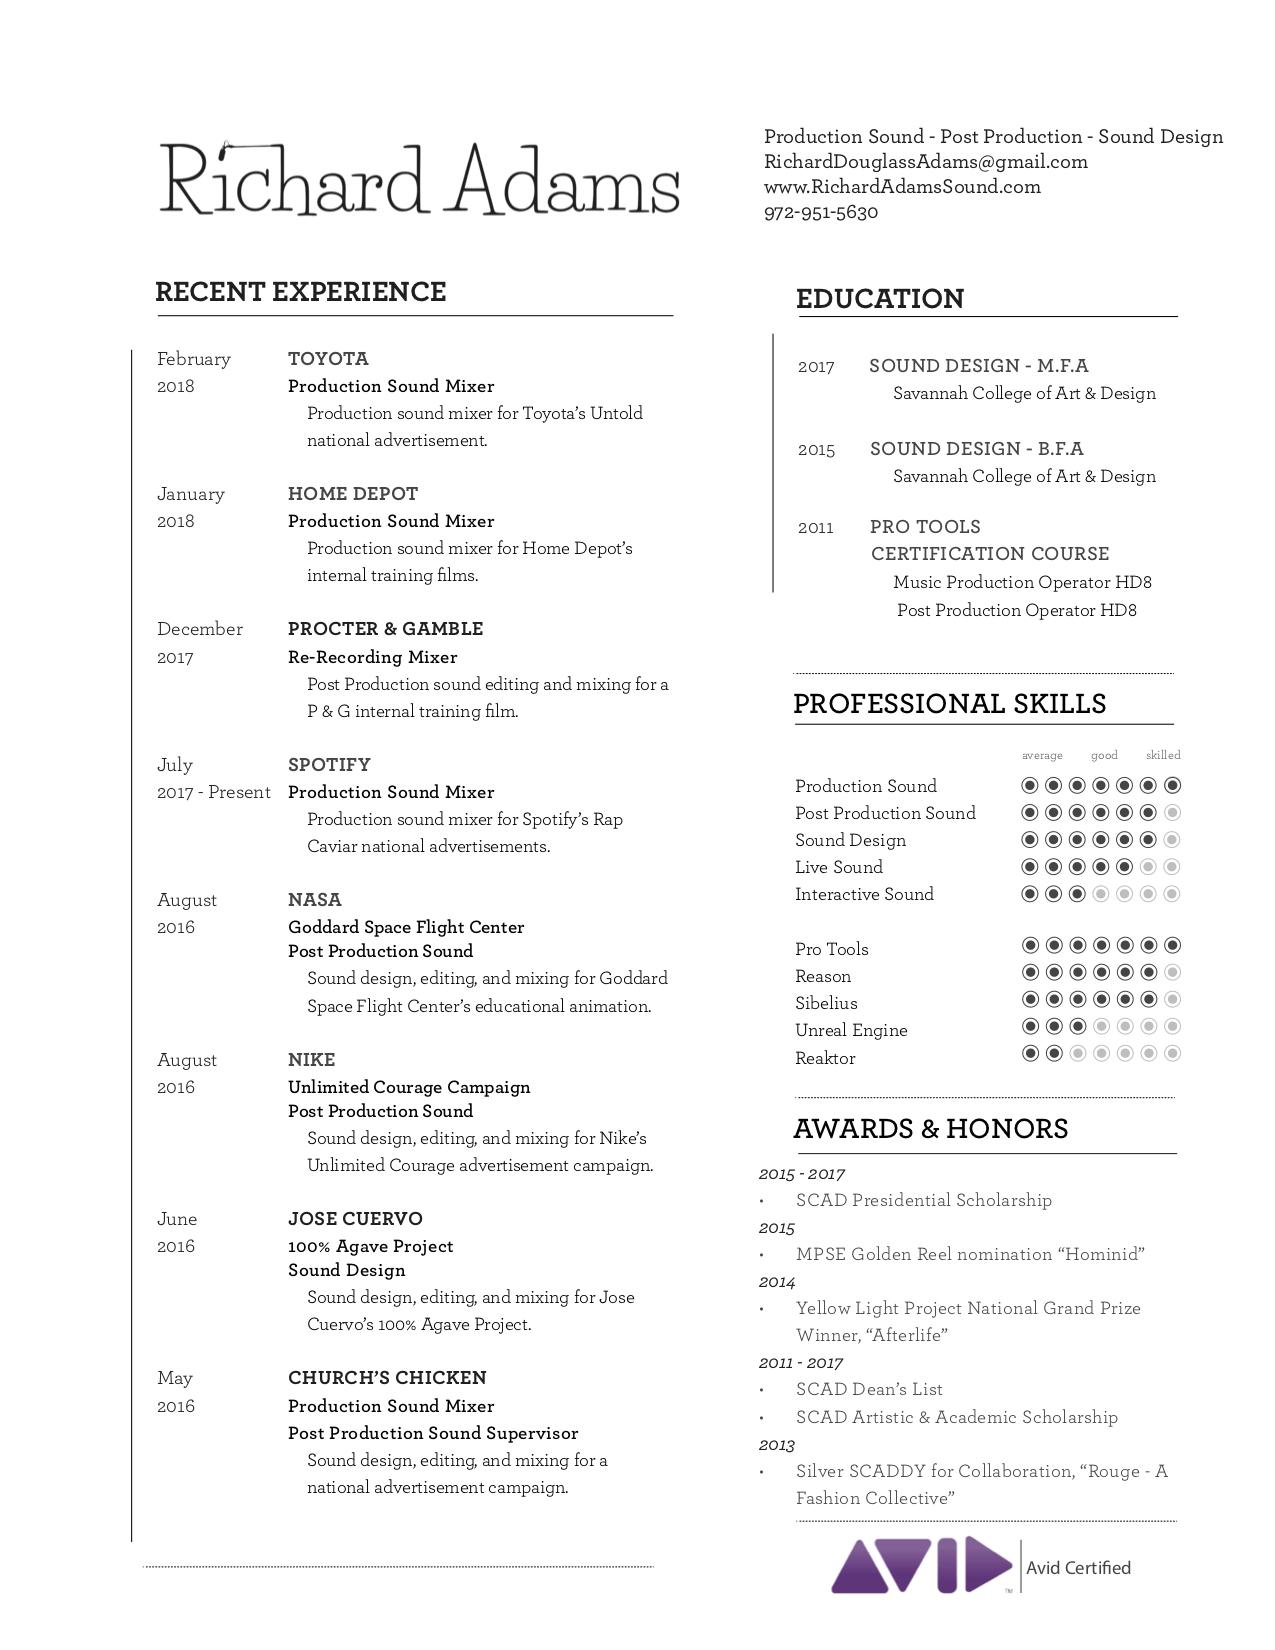 Richard_Adams_Resume_02_15_18.jpg